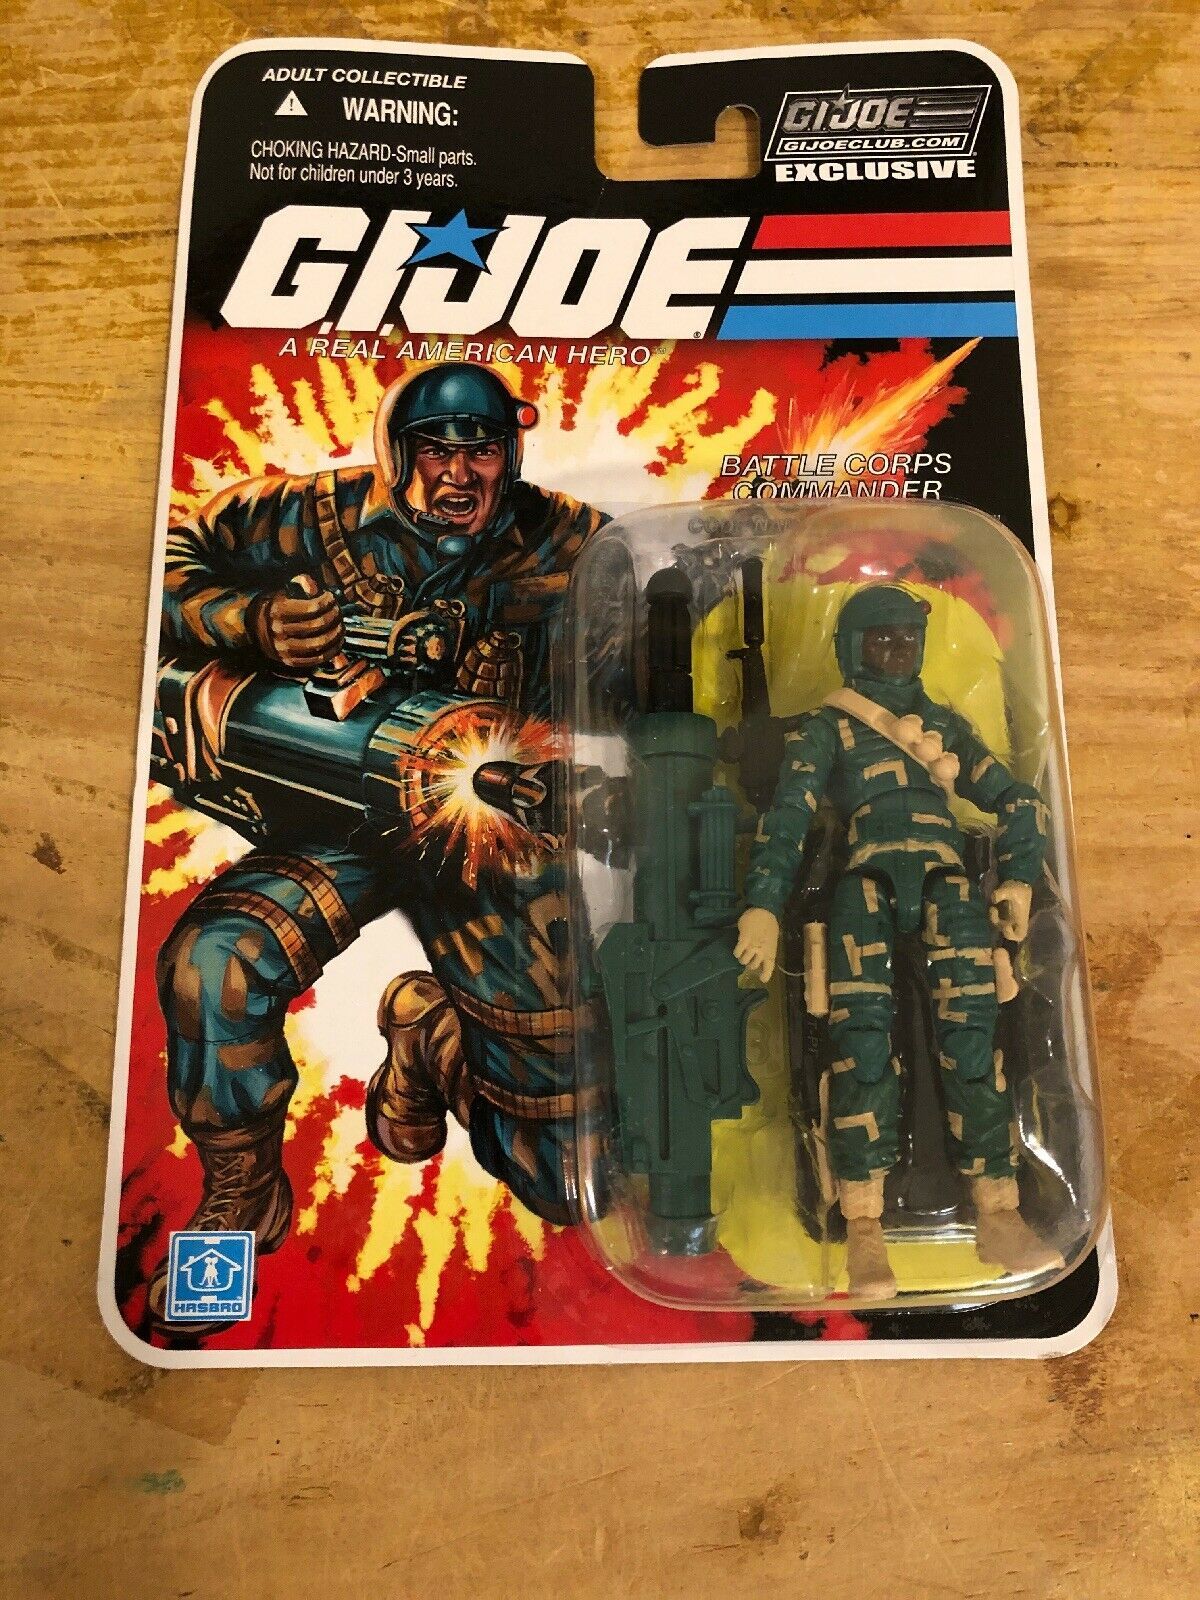 GI joe Fss 8.0 Bullet Proof, battaglia Corps Comuomoder, Mint on Sealed autod, Moc